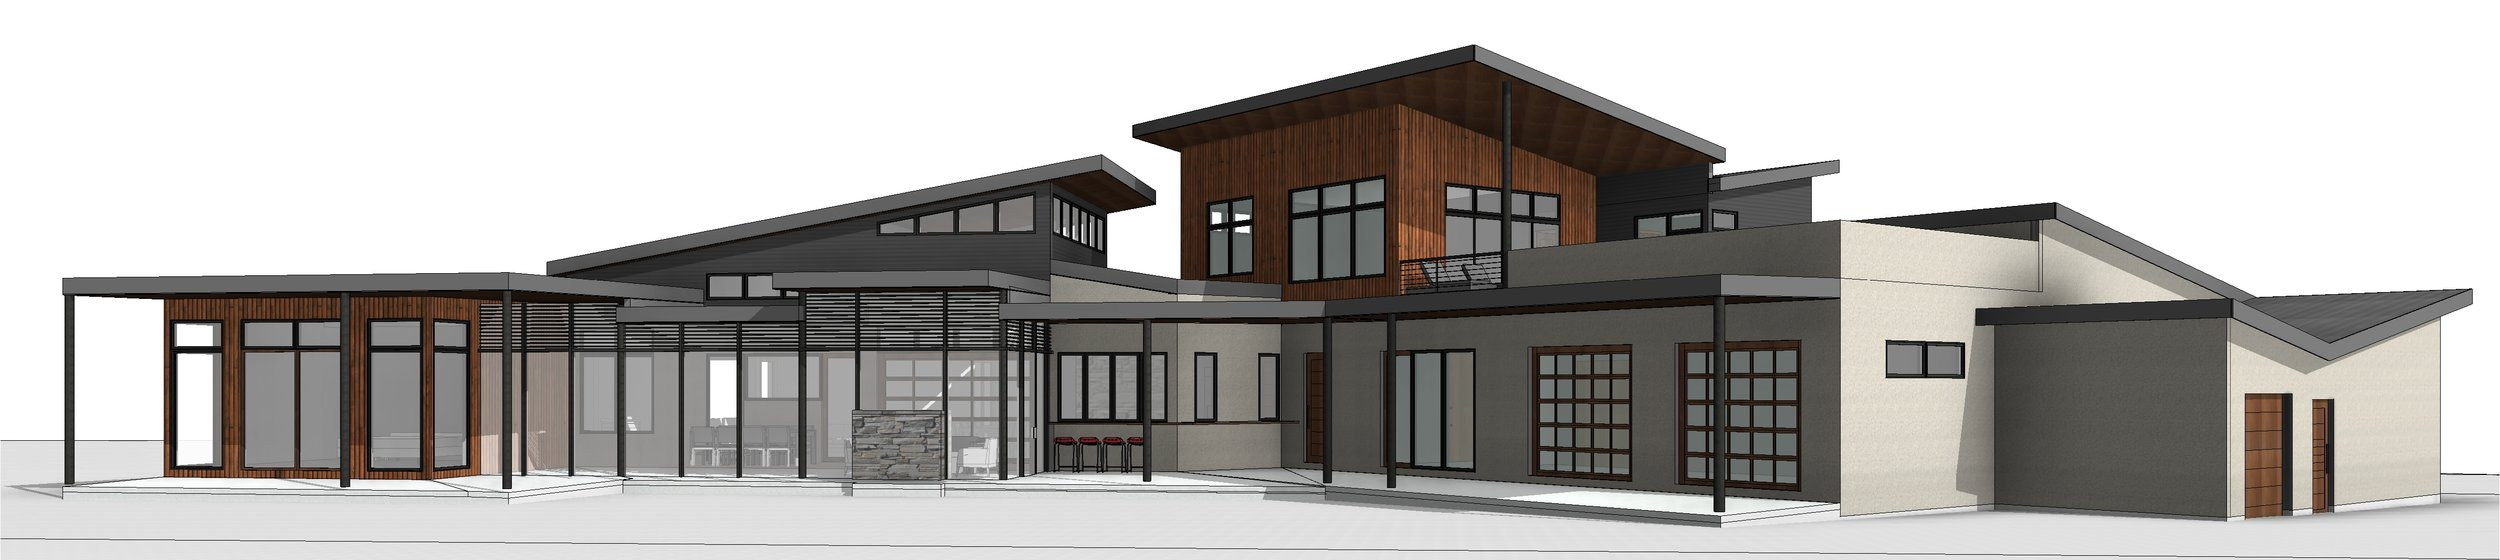 Schreiber Residence - Material Studies 3 - 3D View - REAR PERSPECTIVE 2.jpg